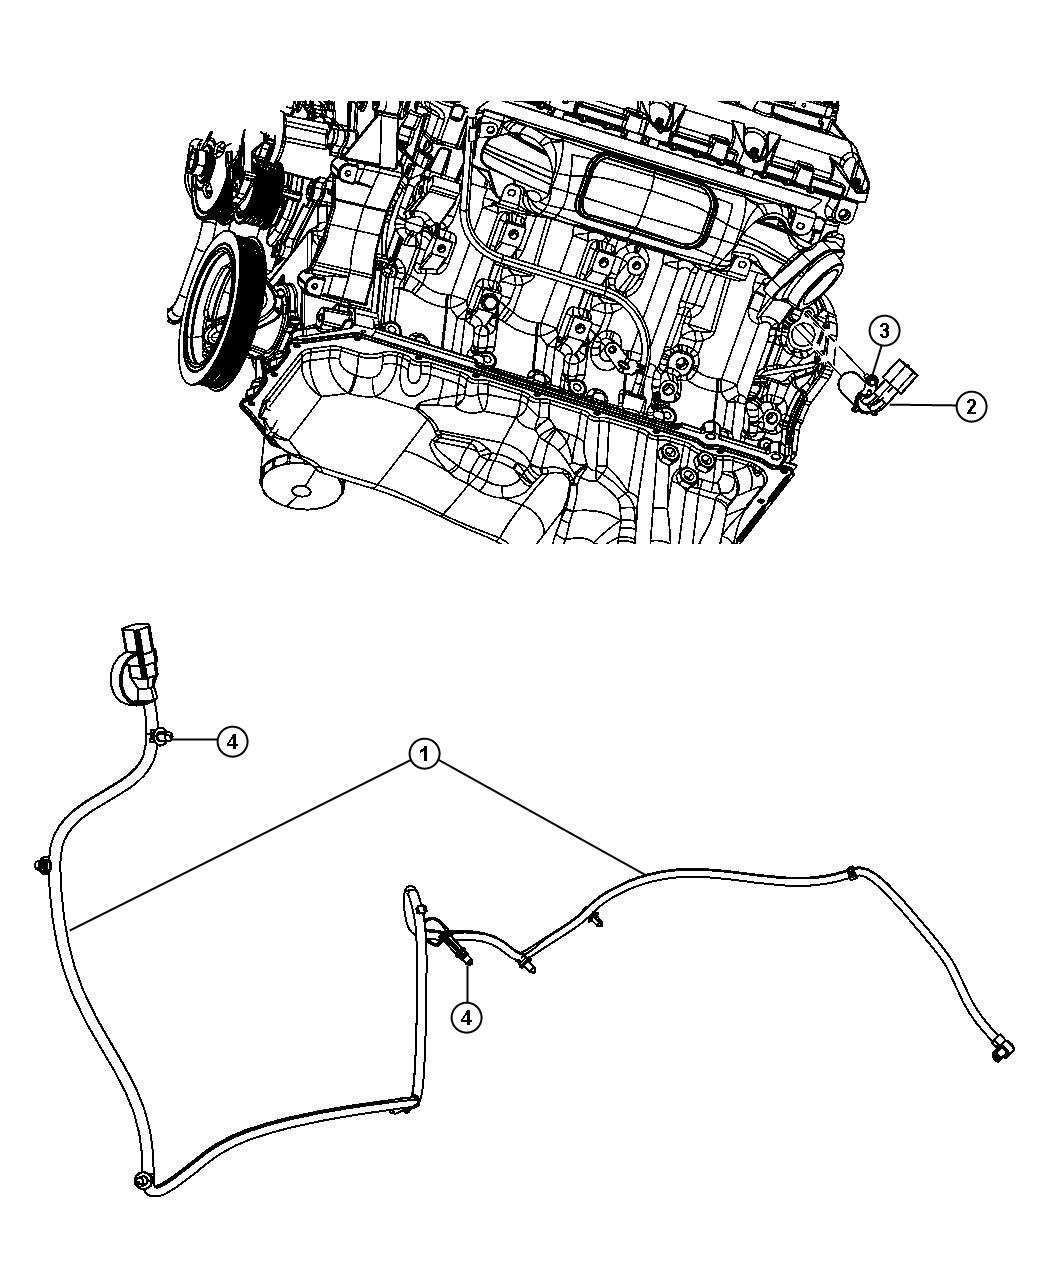 2009 Dodge Ram 1500 Engine Cylinder Block Heater 5.7L [5